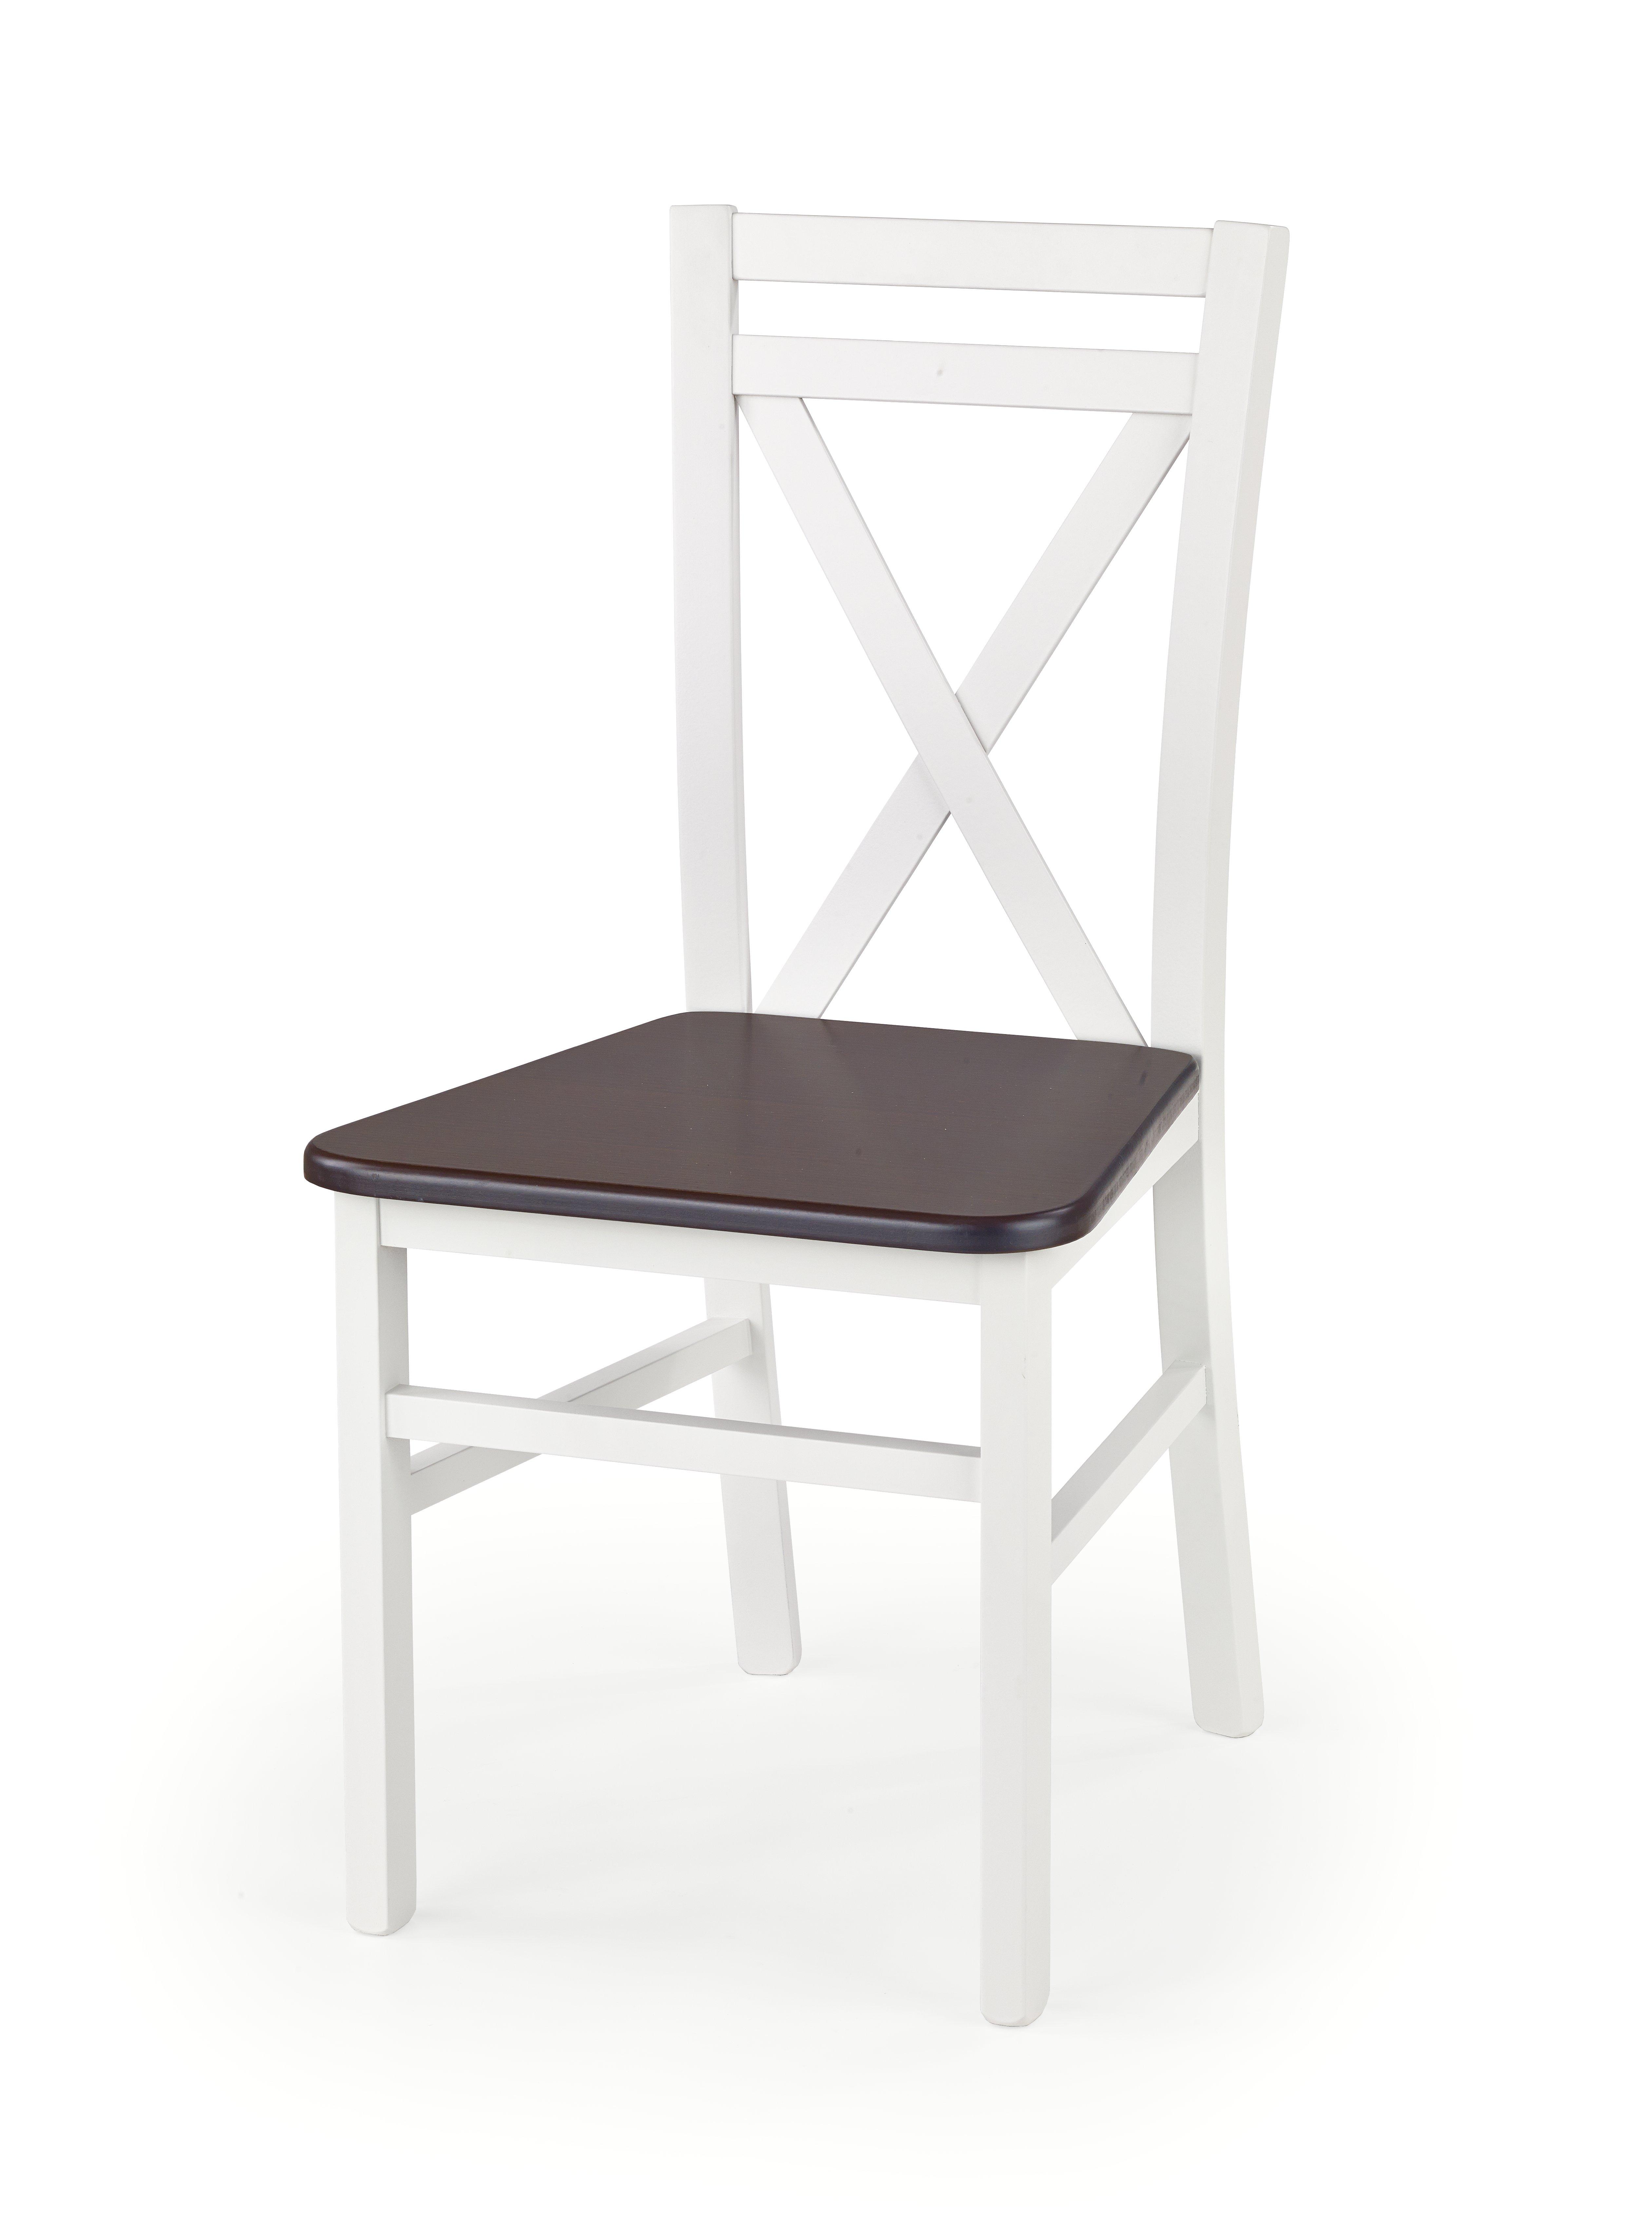 Jídelní židle - Halmar - Dariusz 2 (bílá + tmavý ořech)